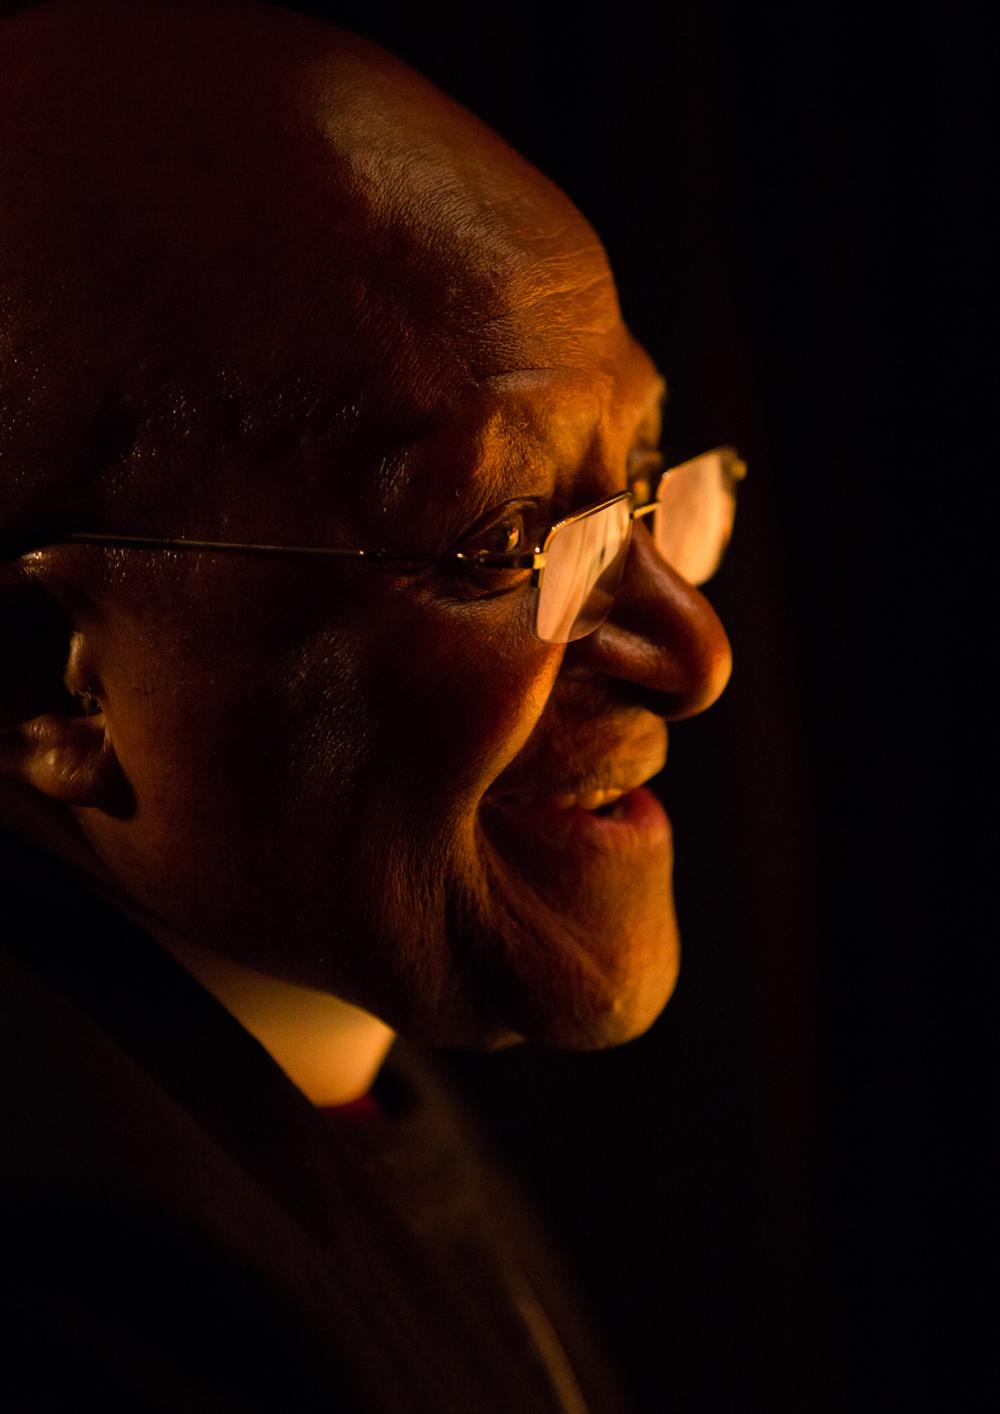 archbishop desmond tutu -  the infectious smiler